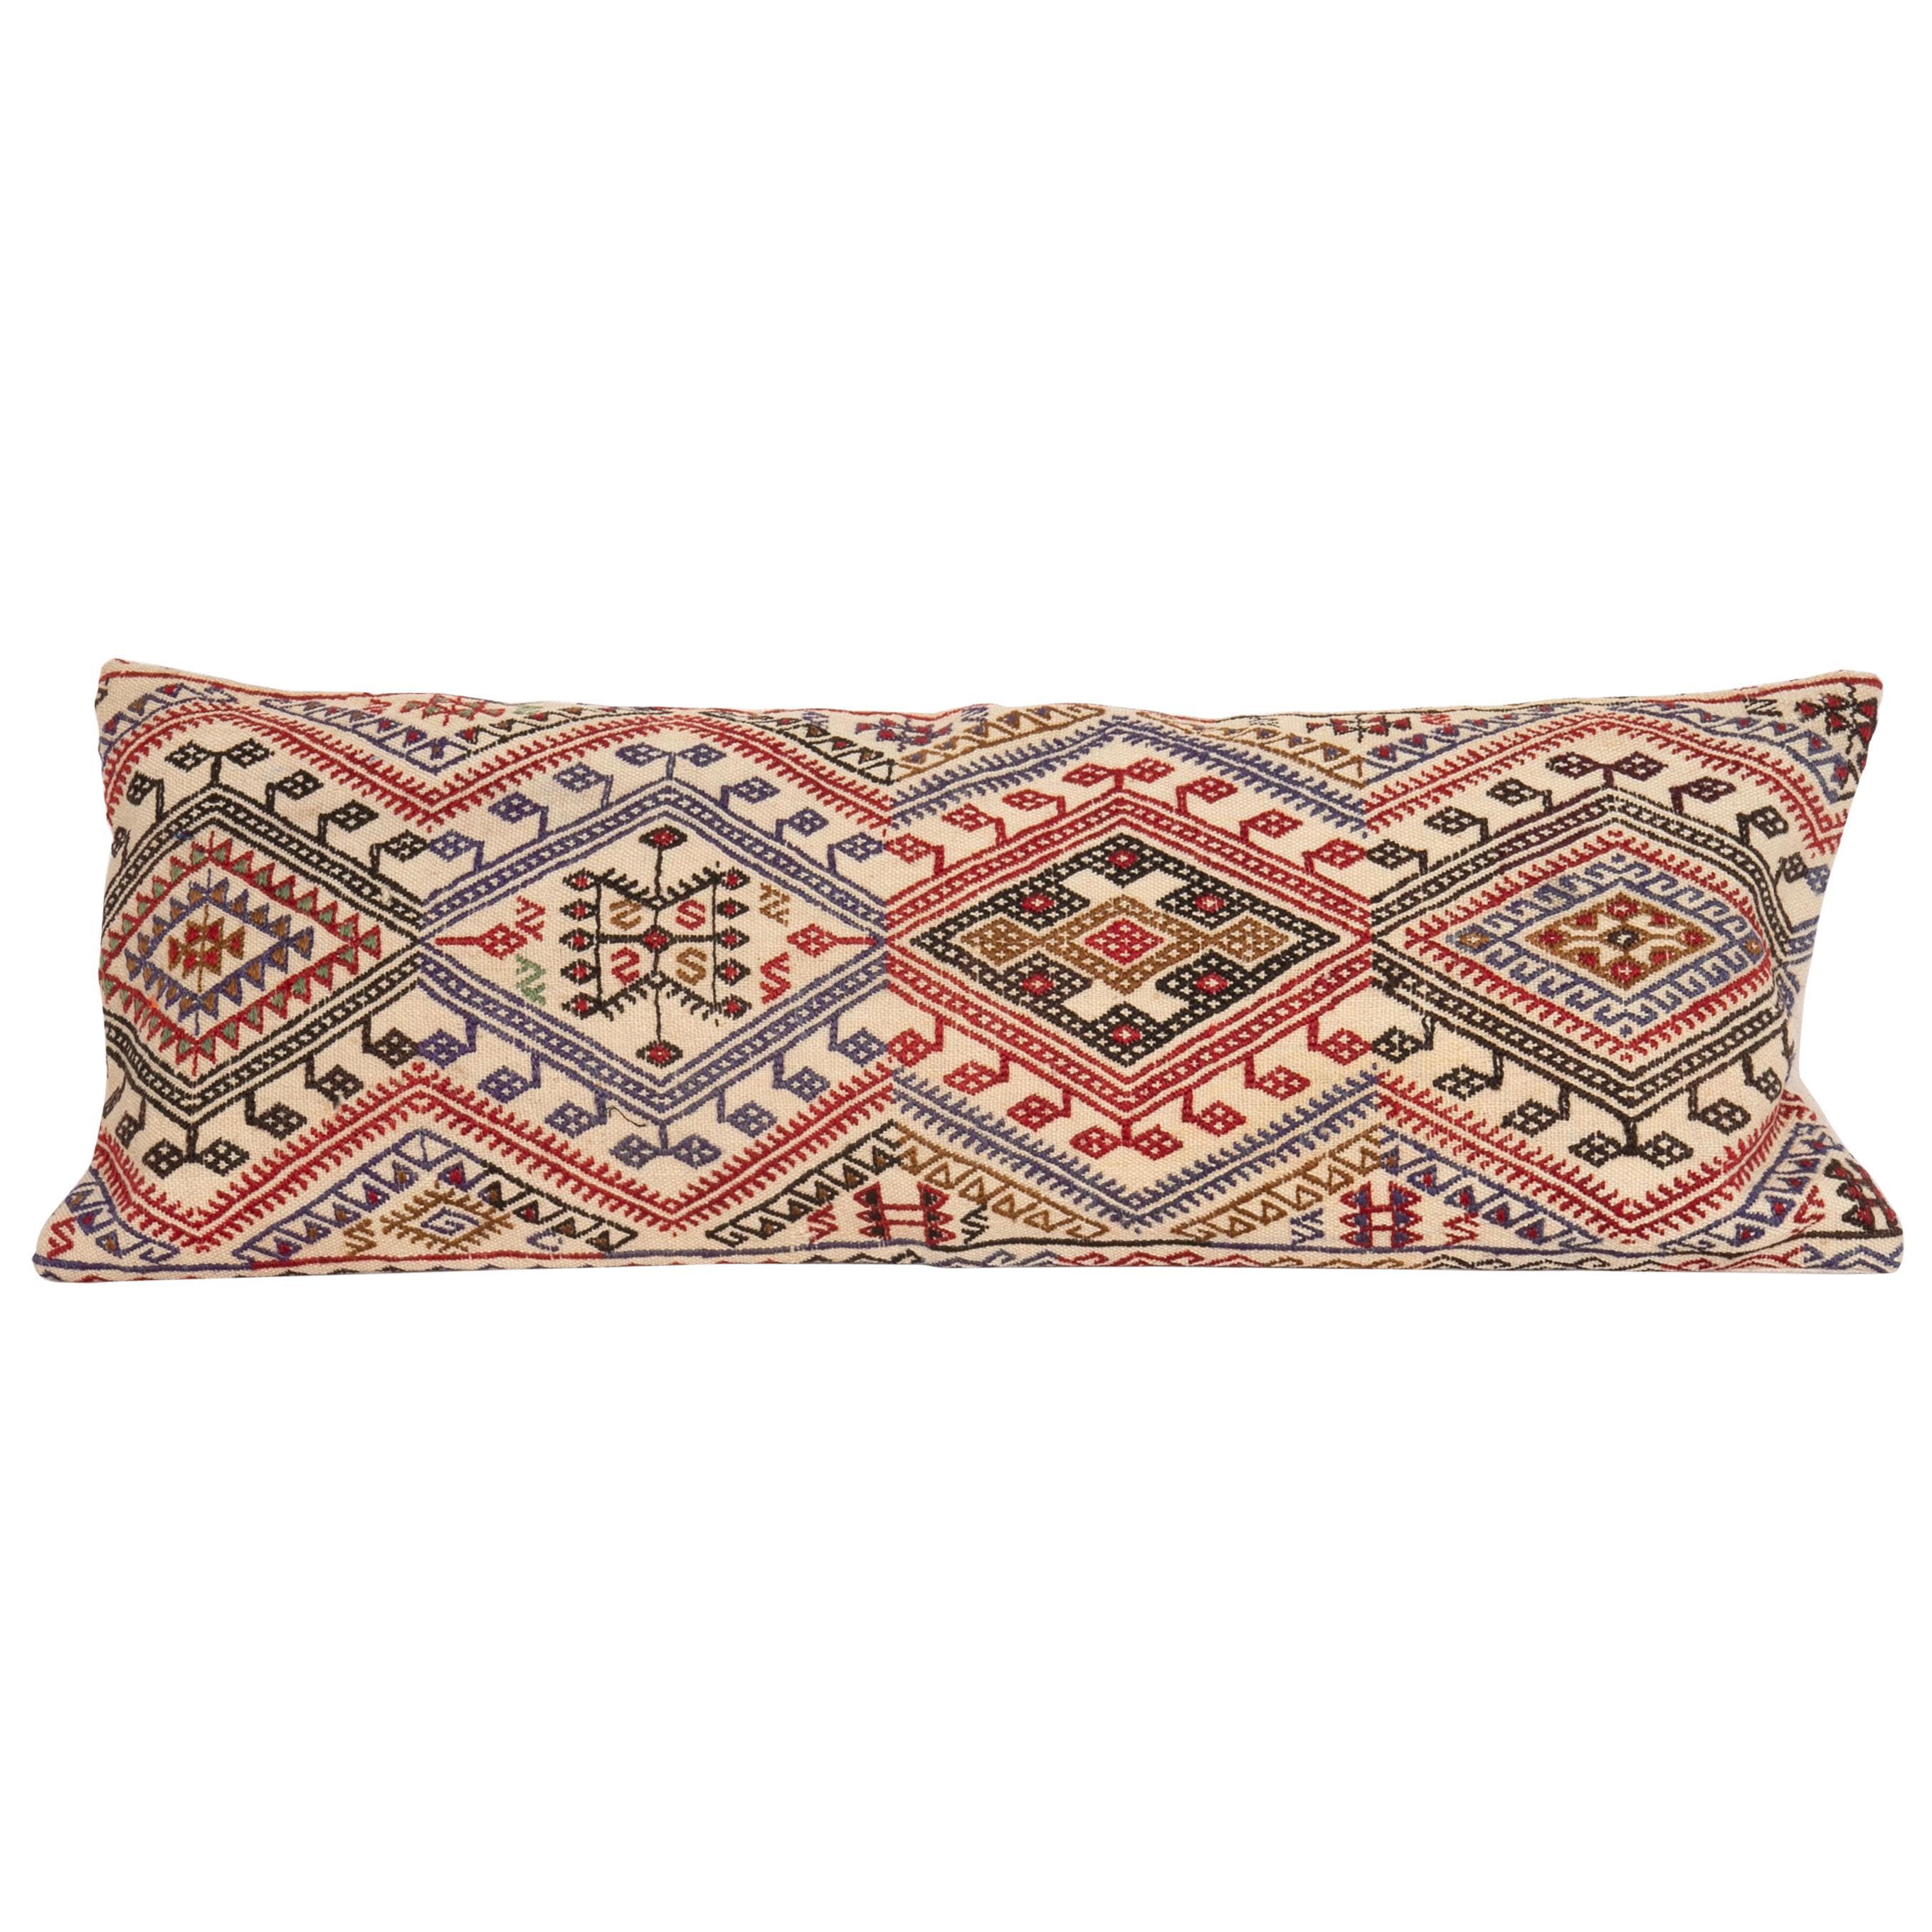 Cicim Kilim Pillow Fashioned from an Anatolian Cicim Kilim, 1930s